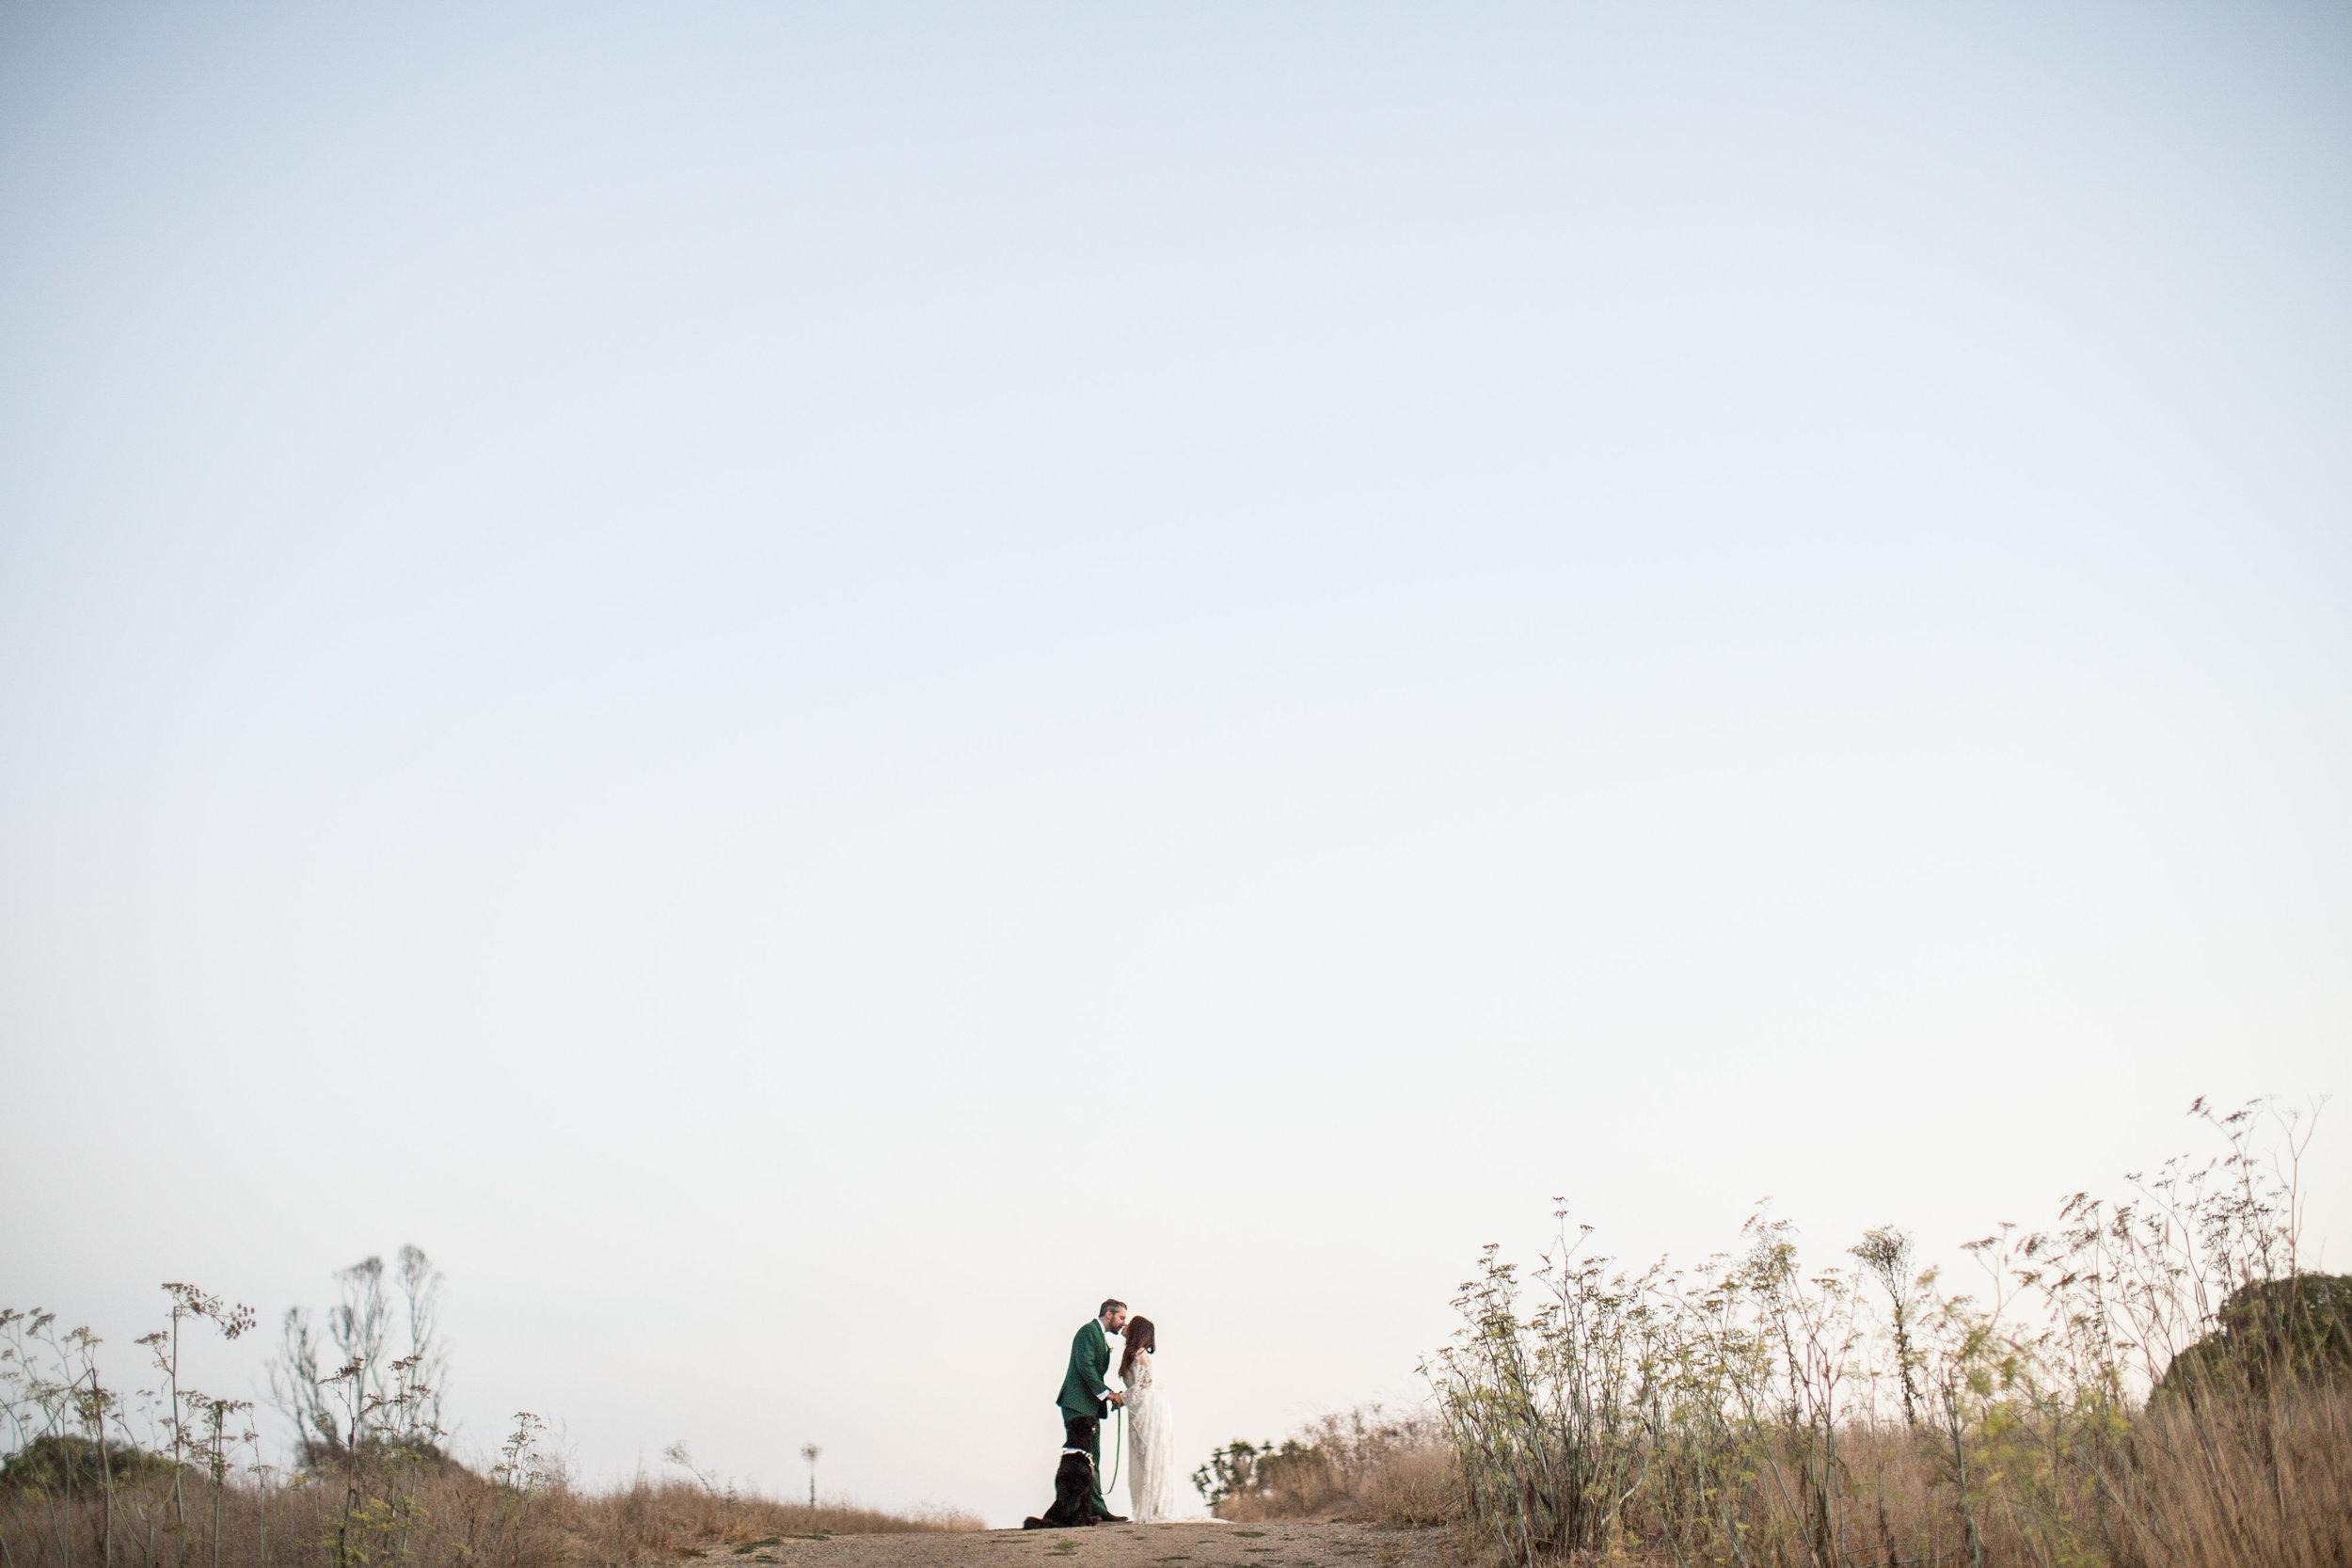 santa-barbara-elopement-elope-wedding-pop-up-coordinator-day-of-event-planning-planner-ellwood-bluff-eucalyptus-grove-rustic-ocean-view-front-hop-green-suit (1 (29).jpg